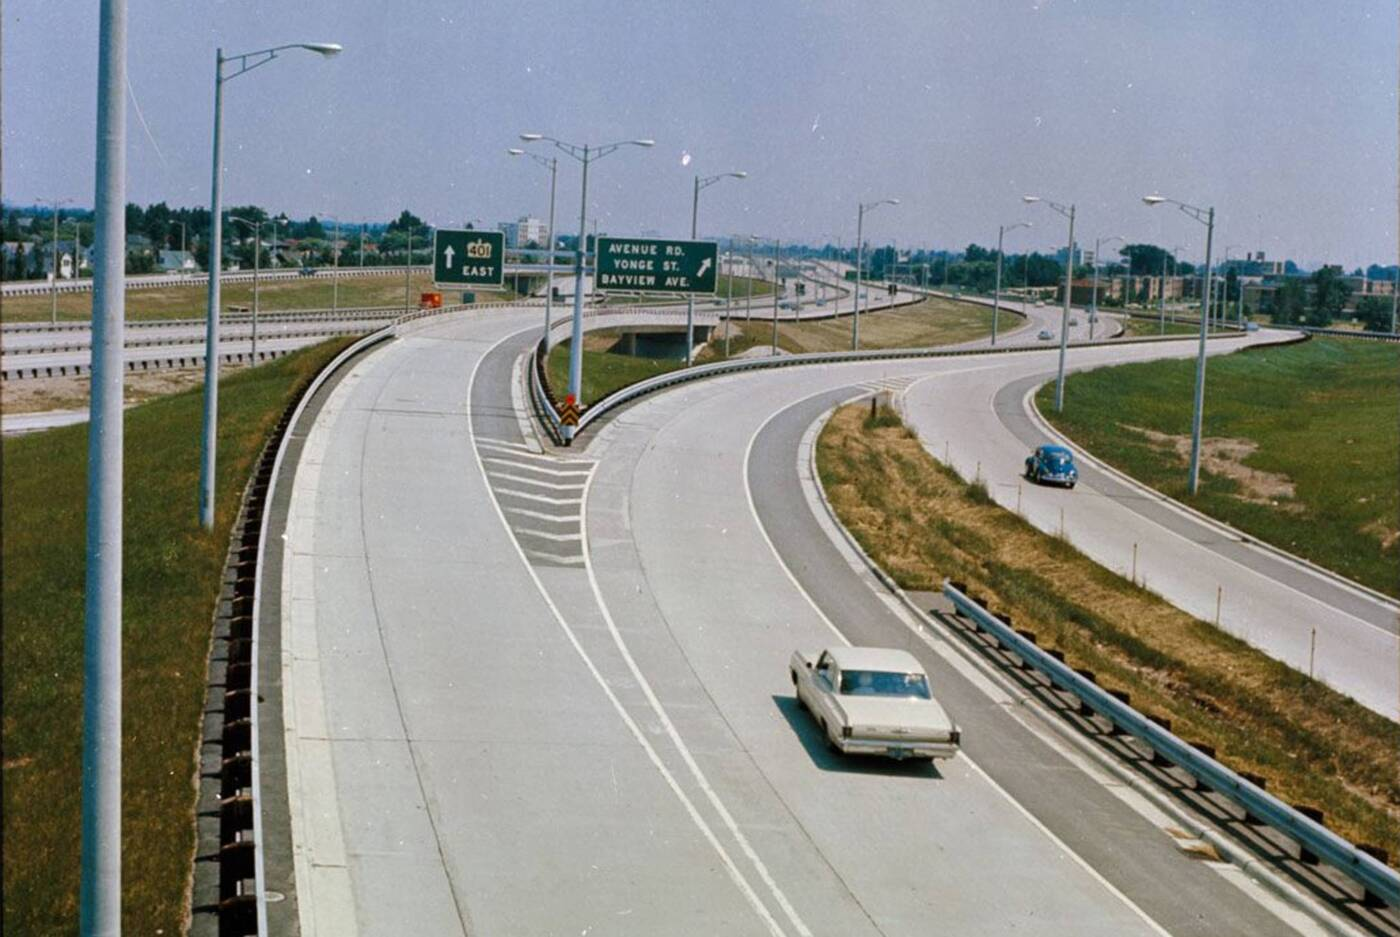 toronto traffic 1960s